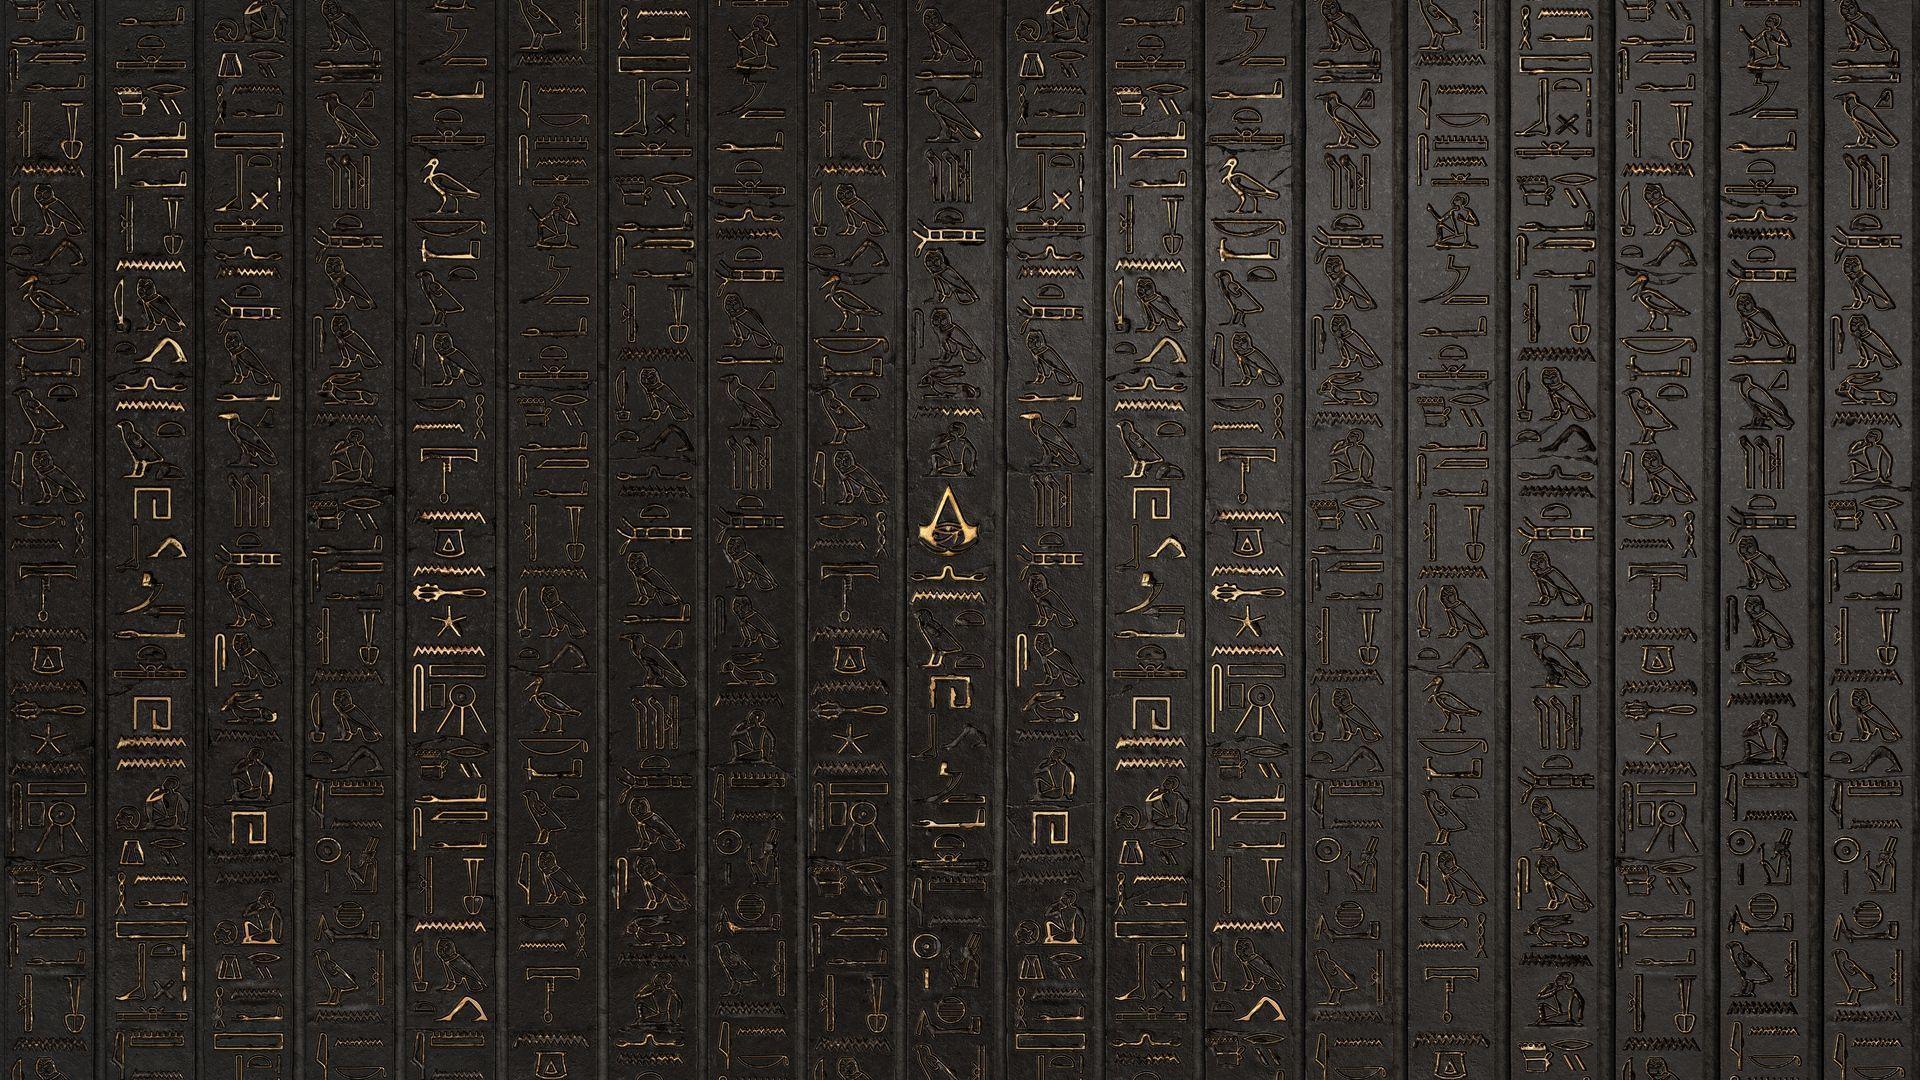 Assassins Creed Origins Wallpaper: Assassin's Creed: Origins Wallpapers